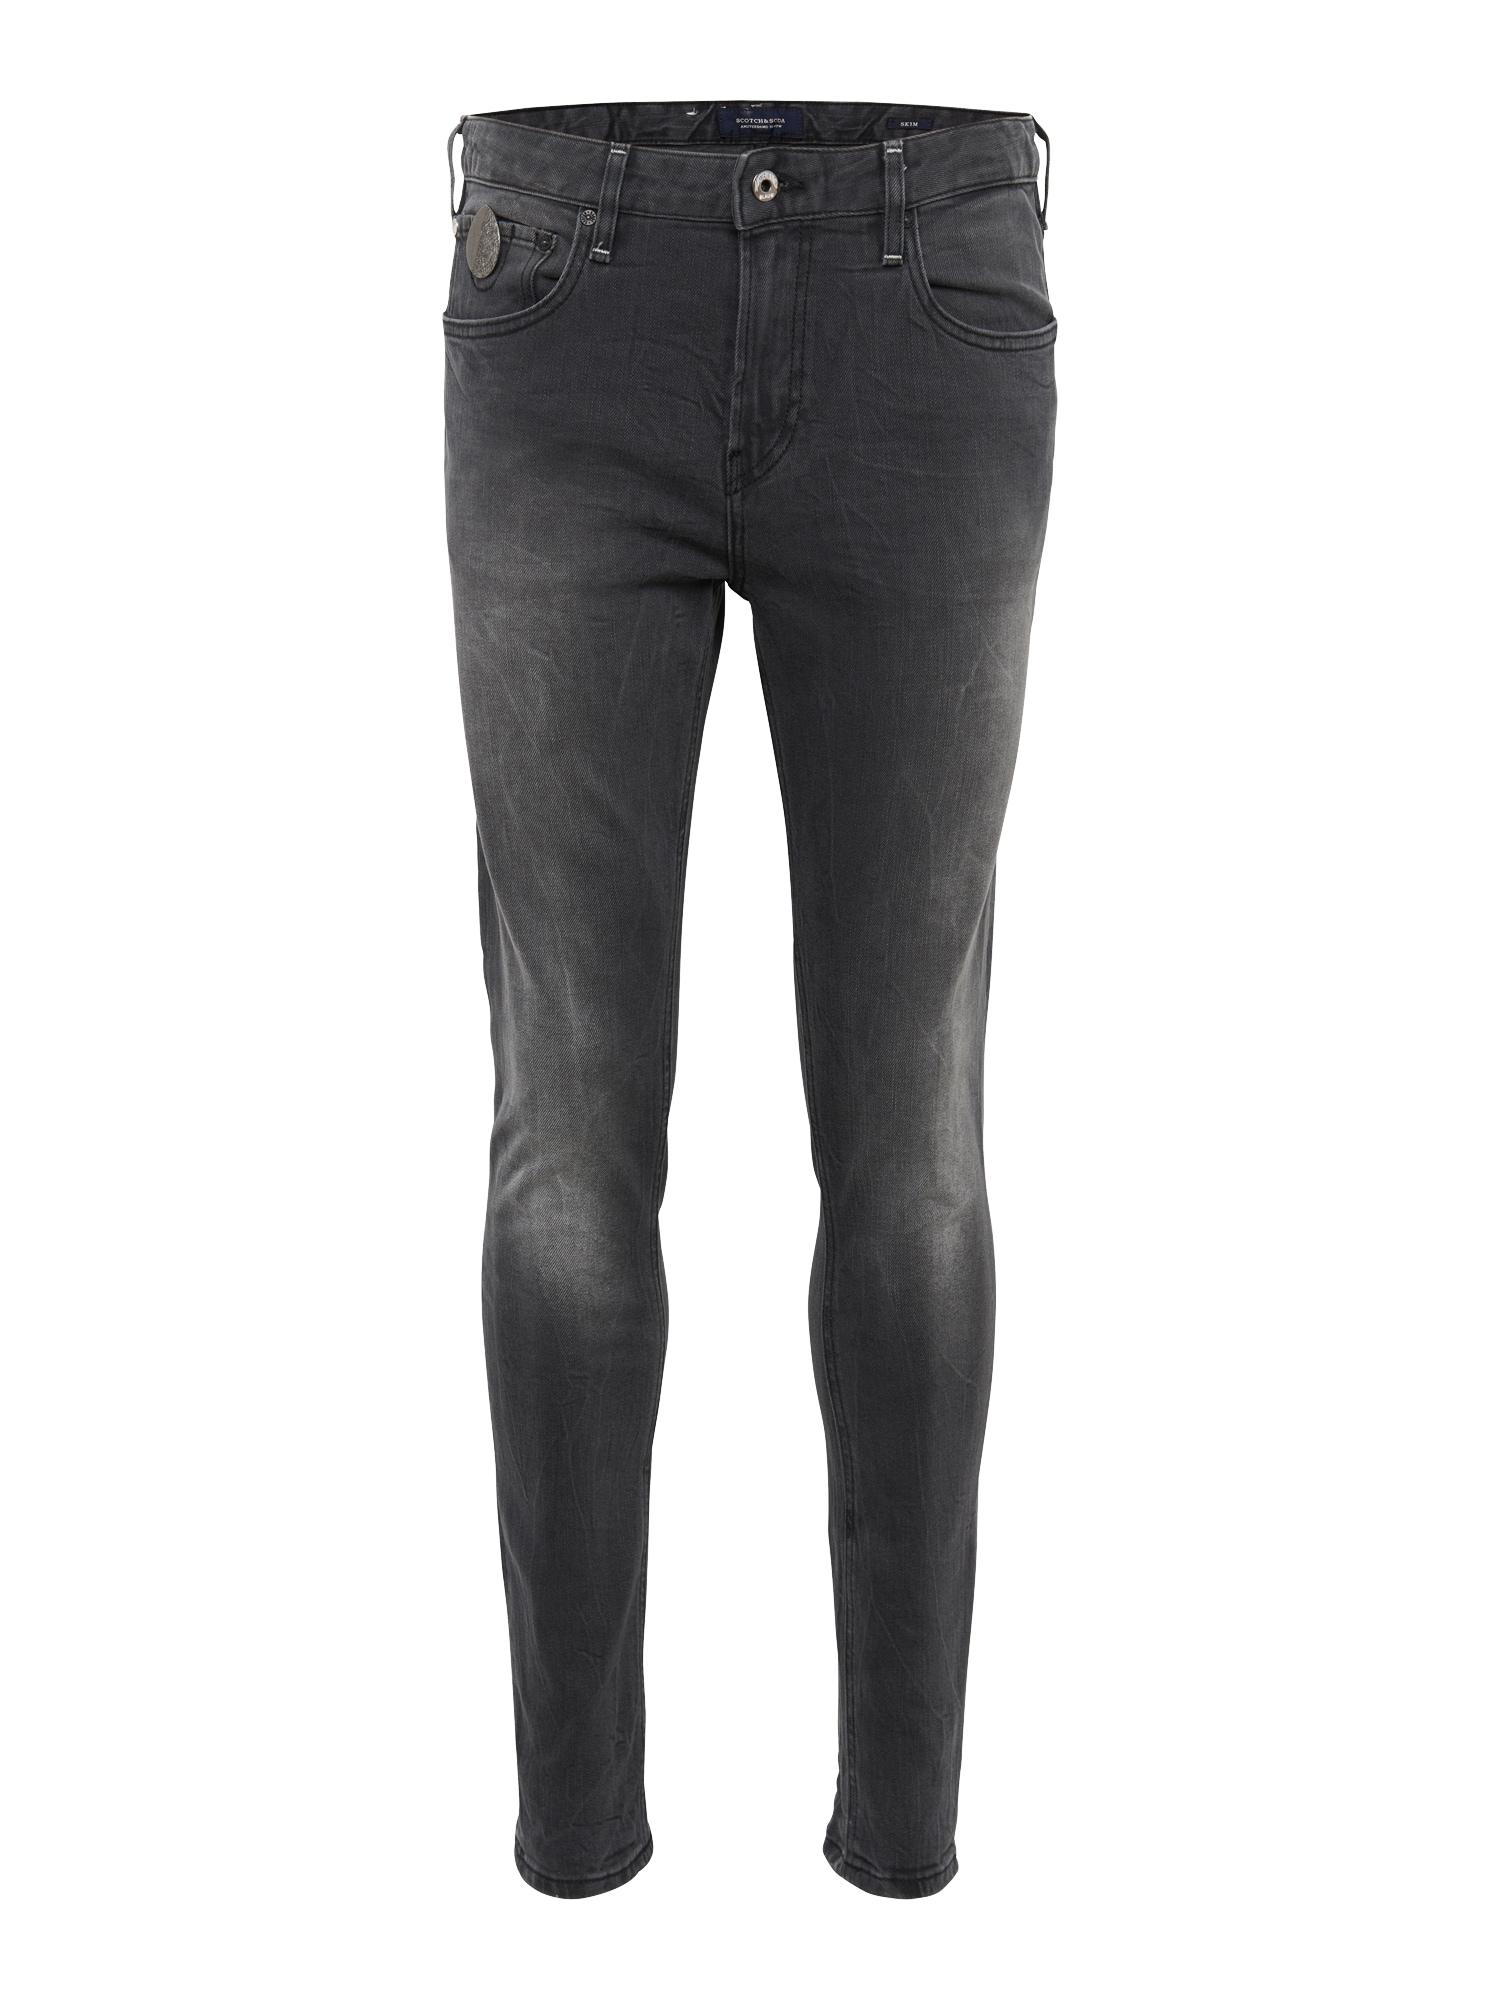 SCOTCH  and  SODA Heren Jeans Skim Dragster black denim